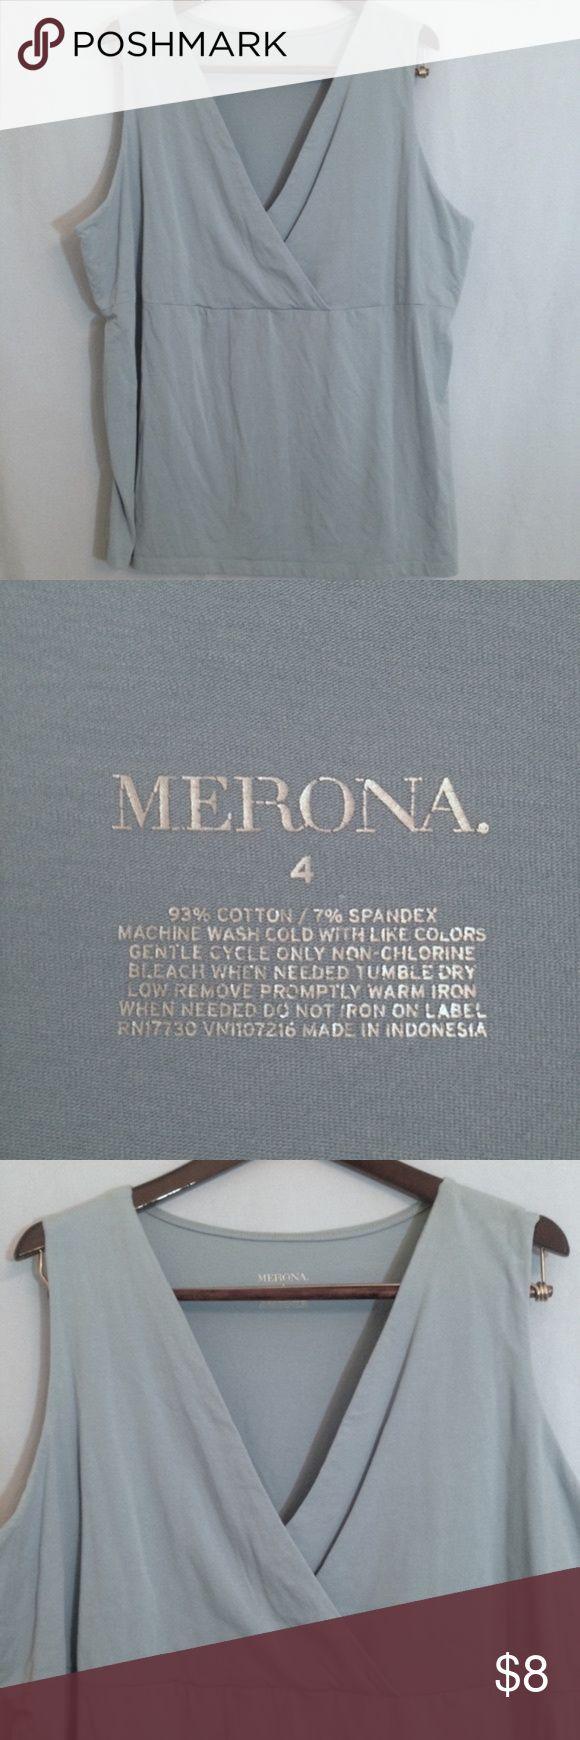 *FINAL* Merona Empire Waist Light Blue Tank Top *FINAL REDUCTION* Merona light blue tank top, empire waist, v-neck, wrap detail in bodice, cotton/spandex. Size 4X. Merona Tops Tank Tops